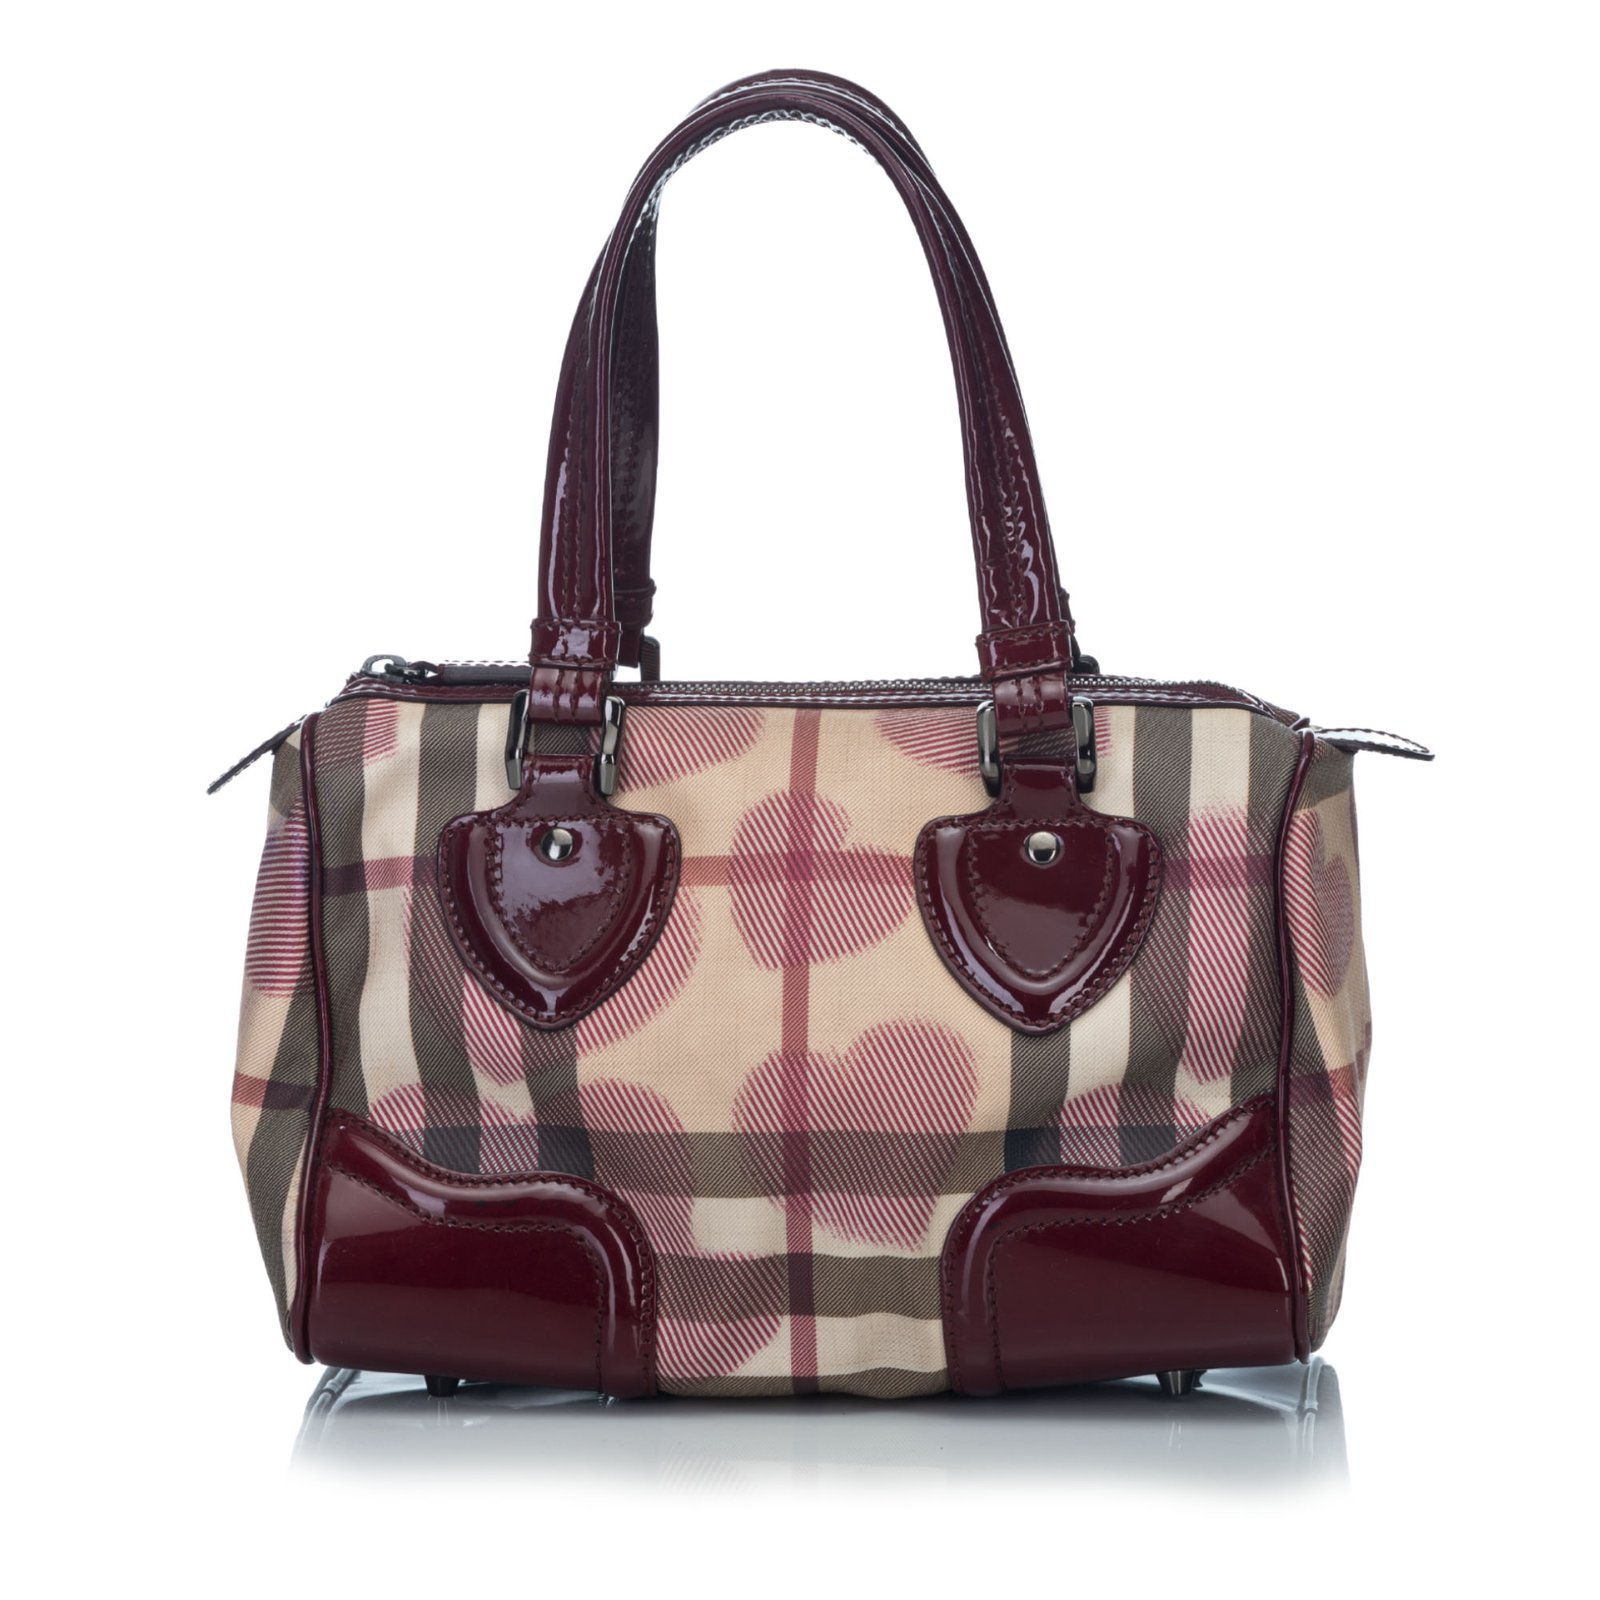 43b40109bbf Burberry Heart Print Boston Bag Handbags Leather,Other,Plastic  Brown,Red,Beige